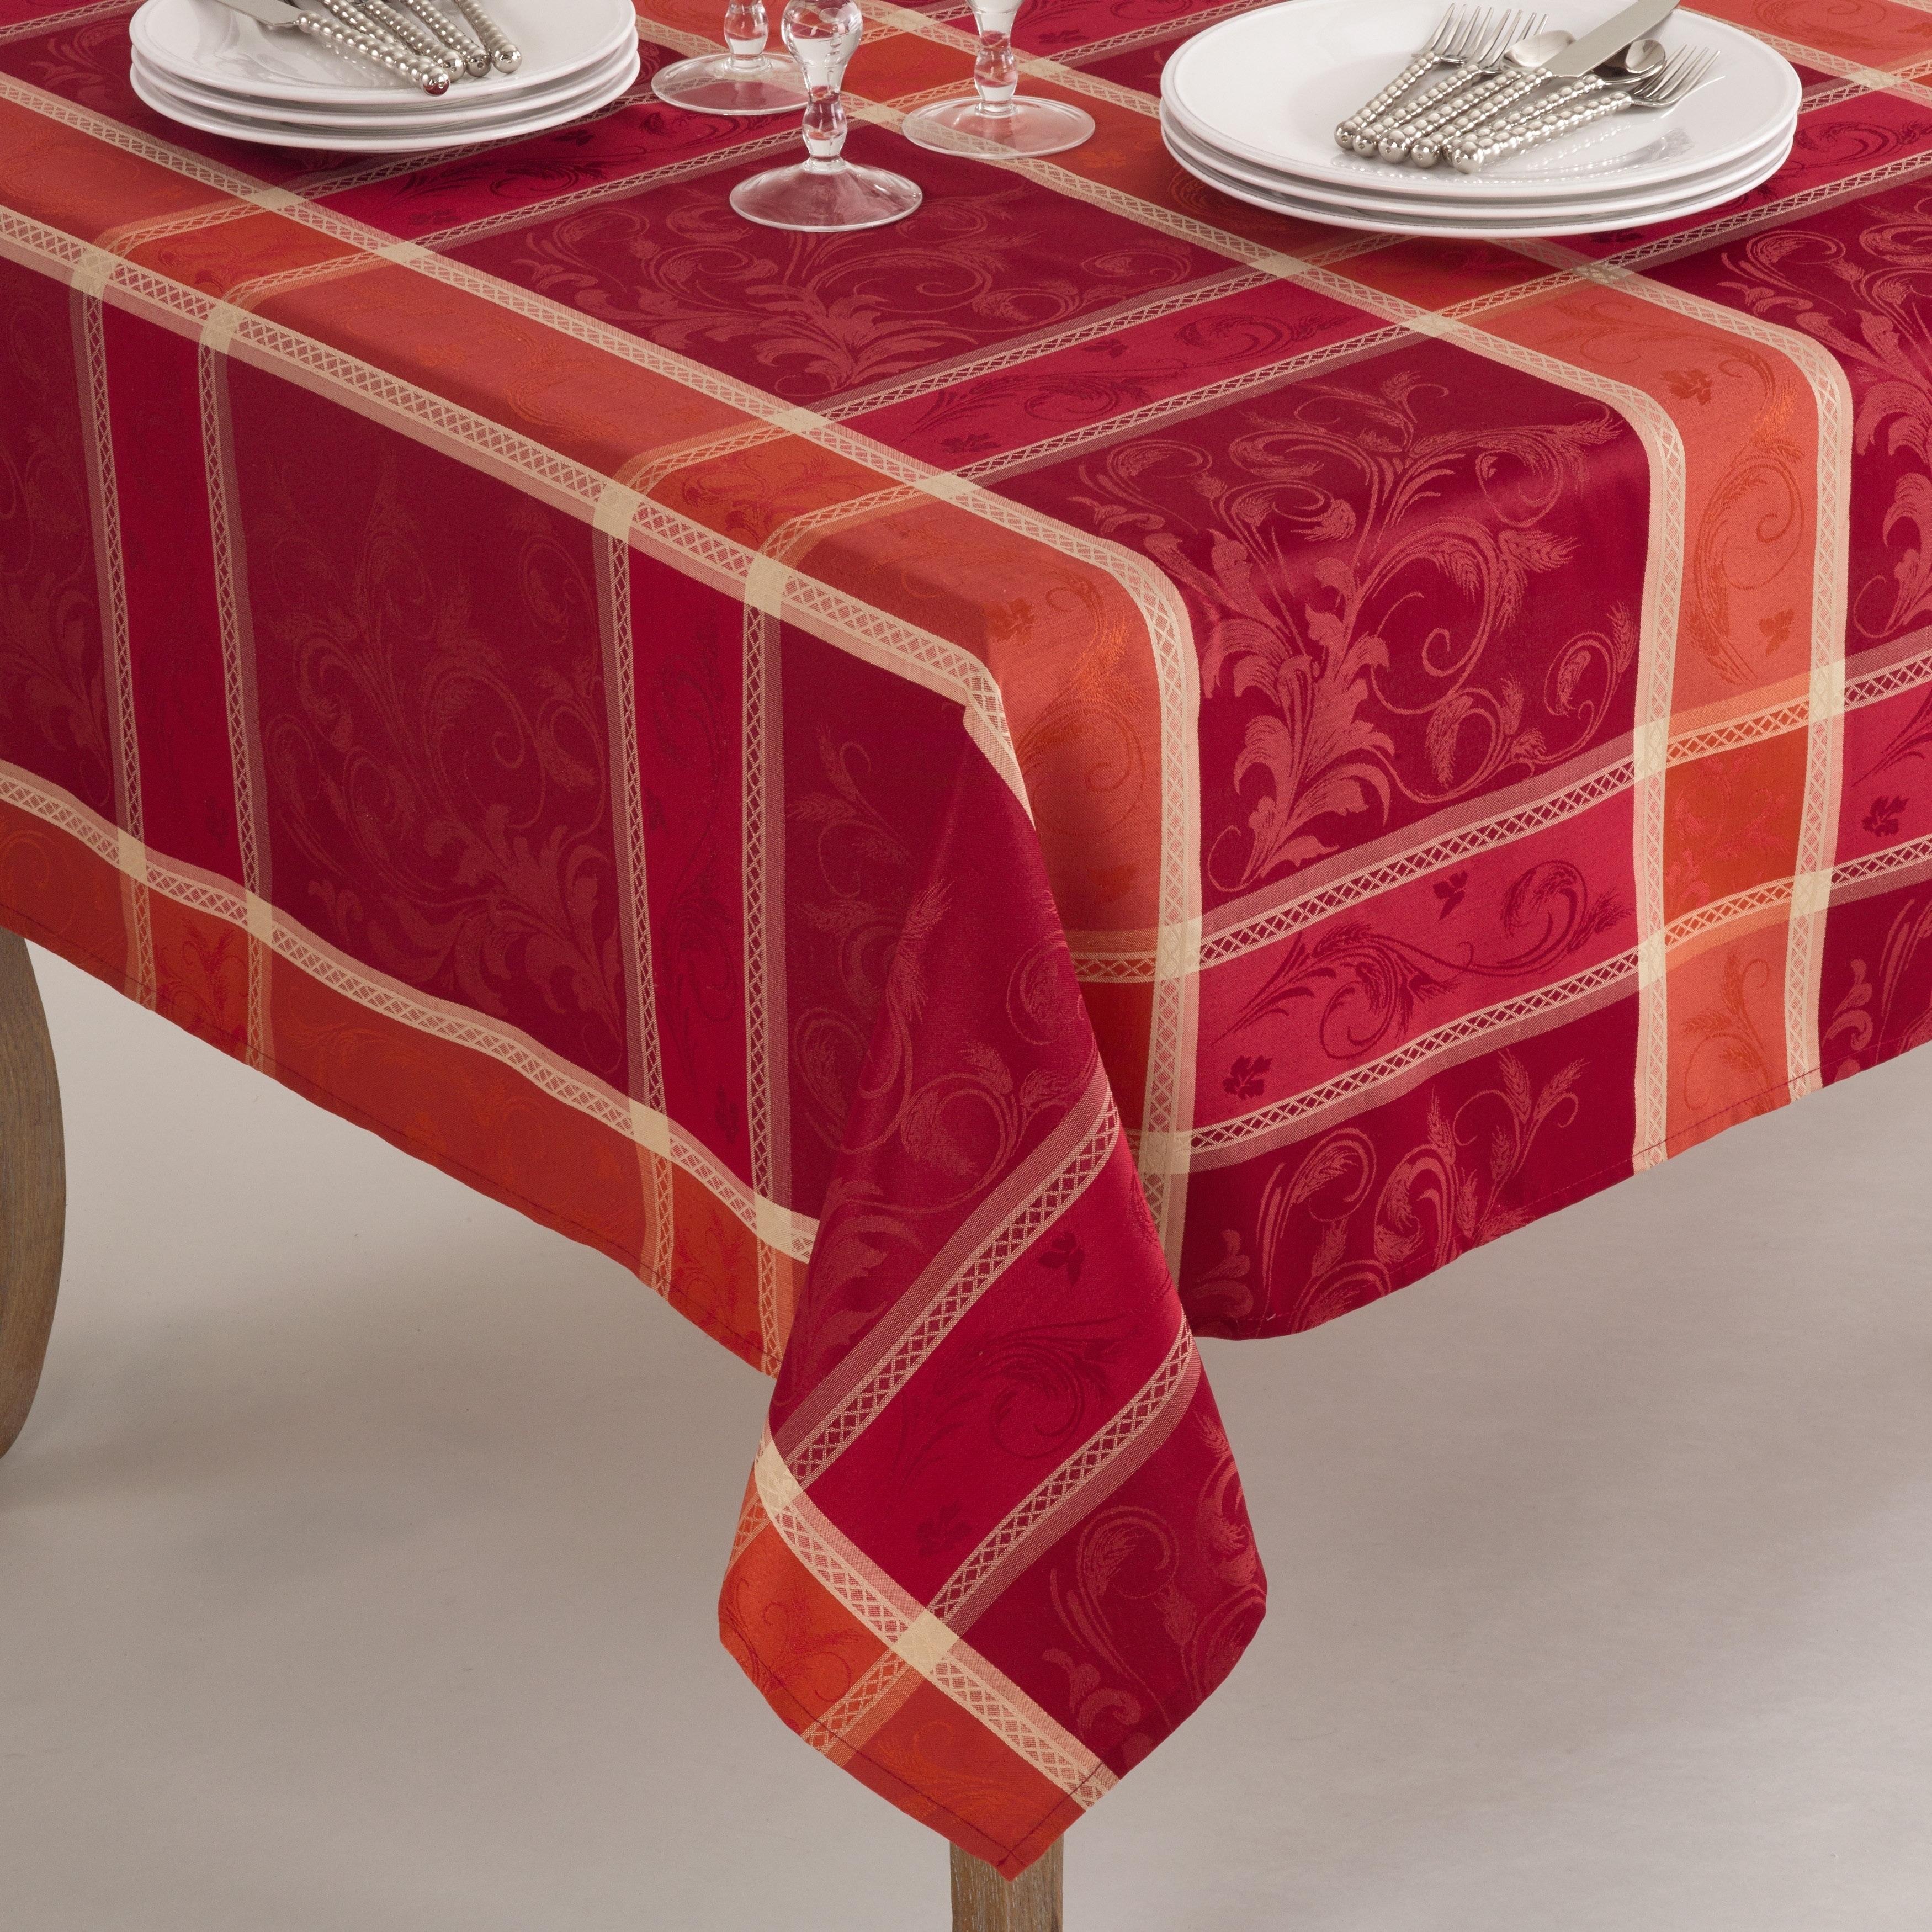 Saro Pumpion Collection Plaid Design Tablecloth (Oblong/7...